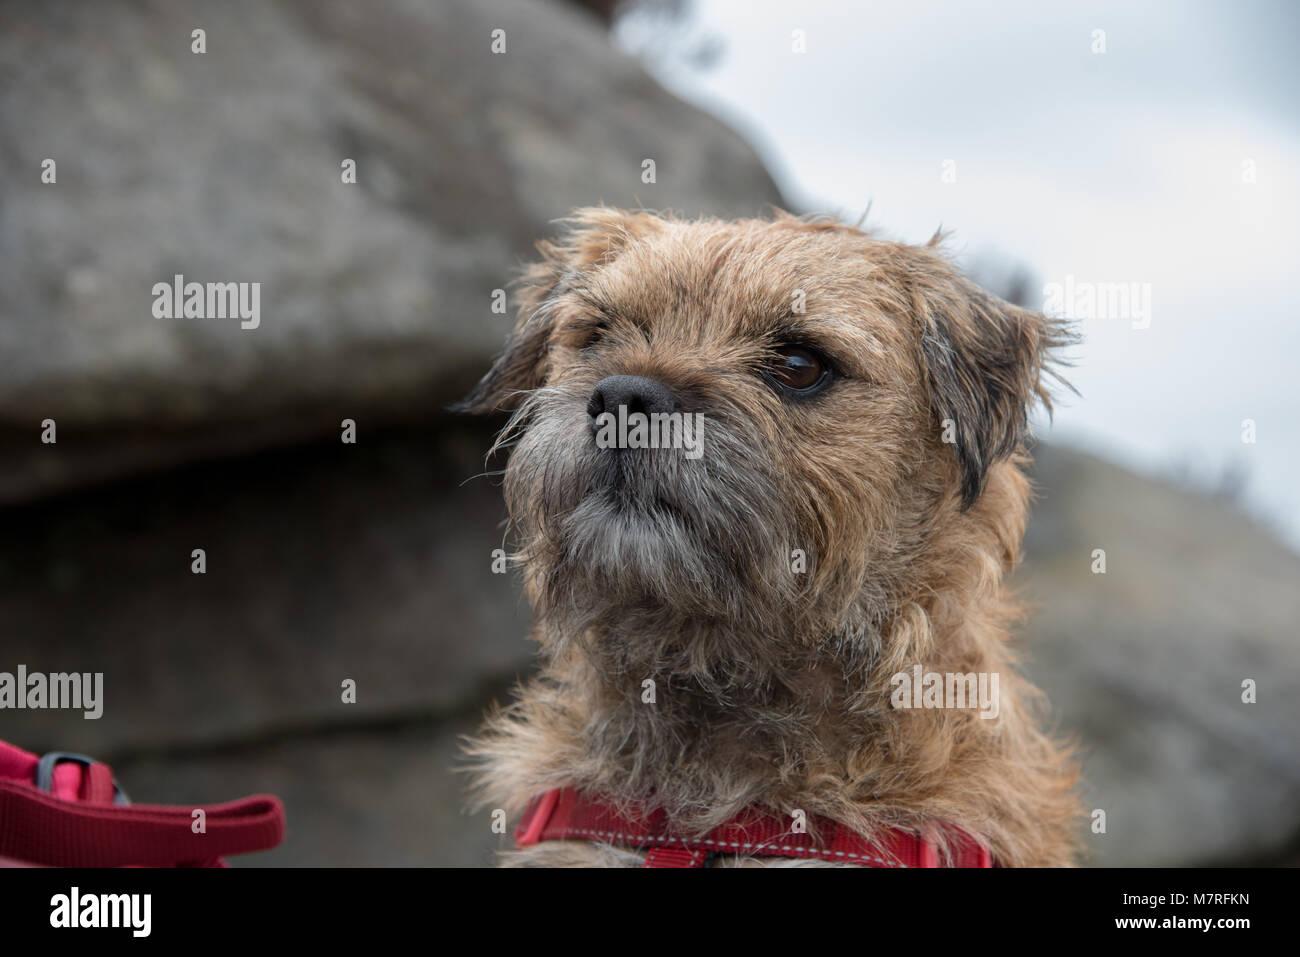 Franky - Stock Image